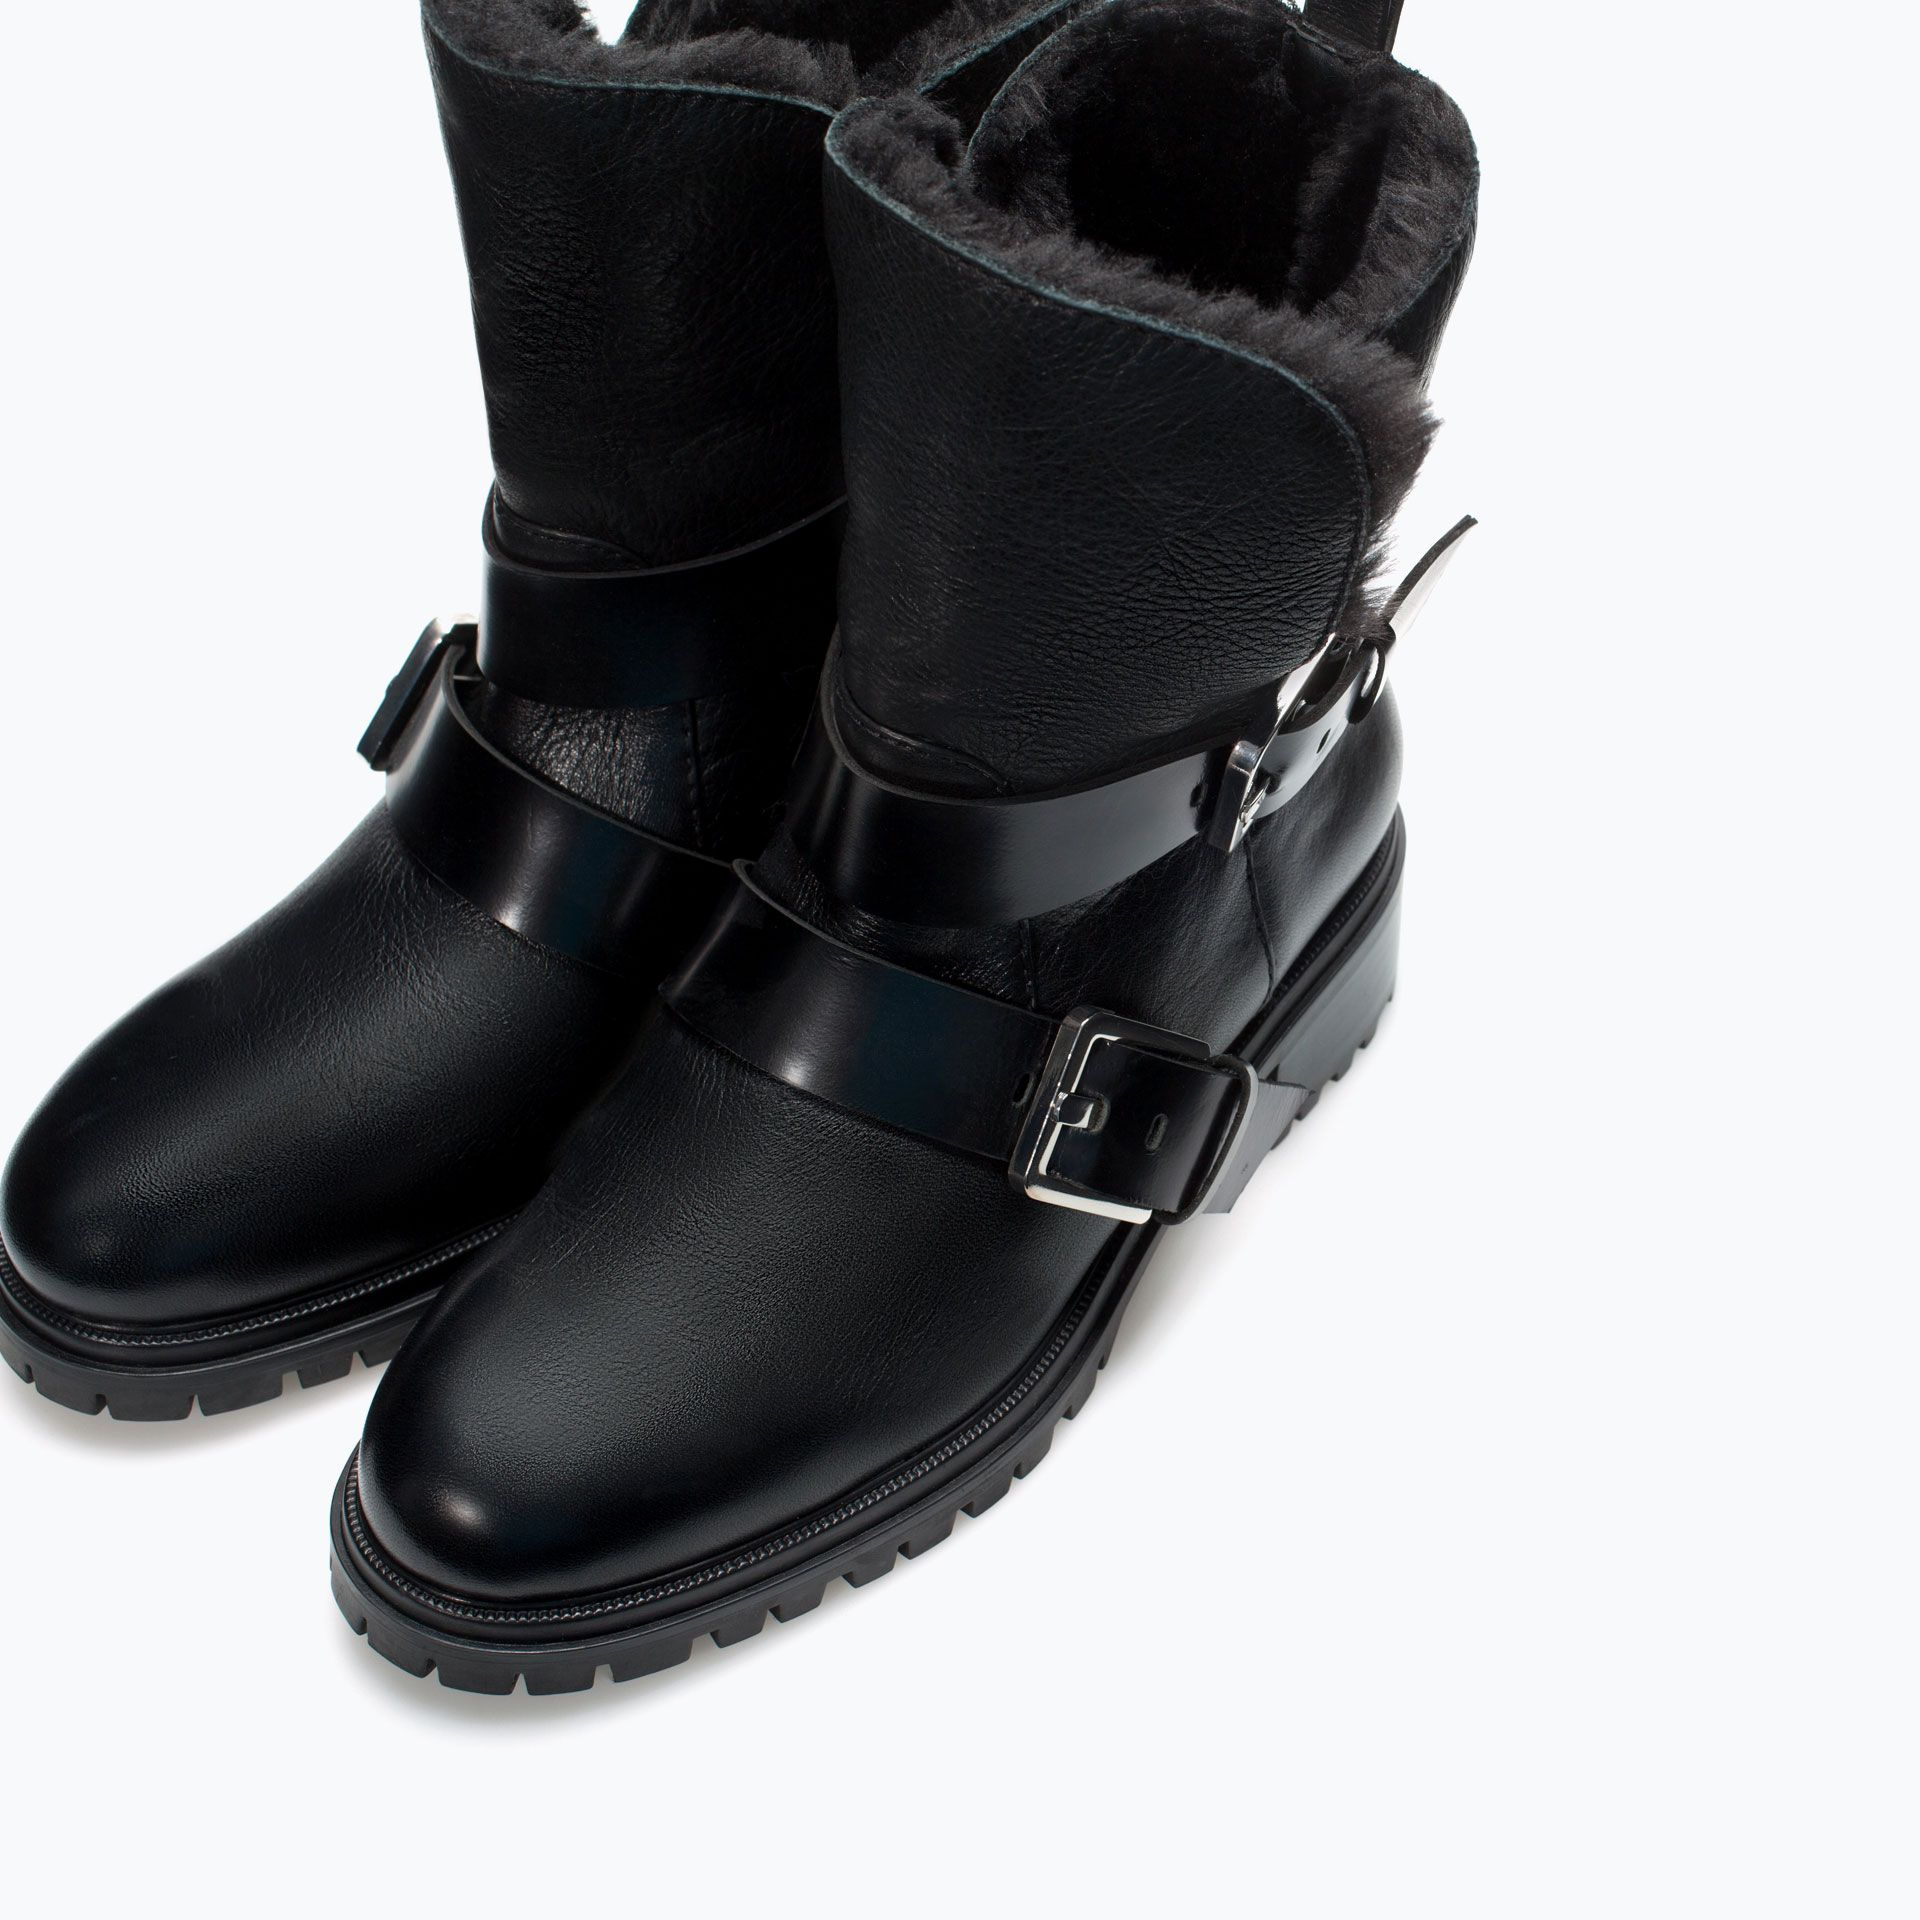 d7755cf27591 Zara   Boots Motard cuir doublure 80% POLYESTER, 20% POLYURÉTHANE Bottes  Fourrées Femme